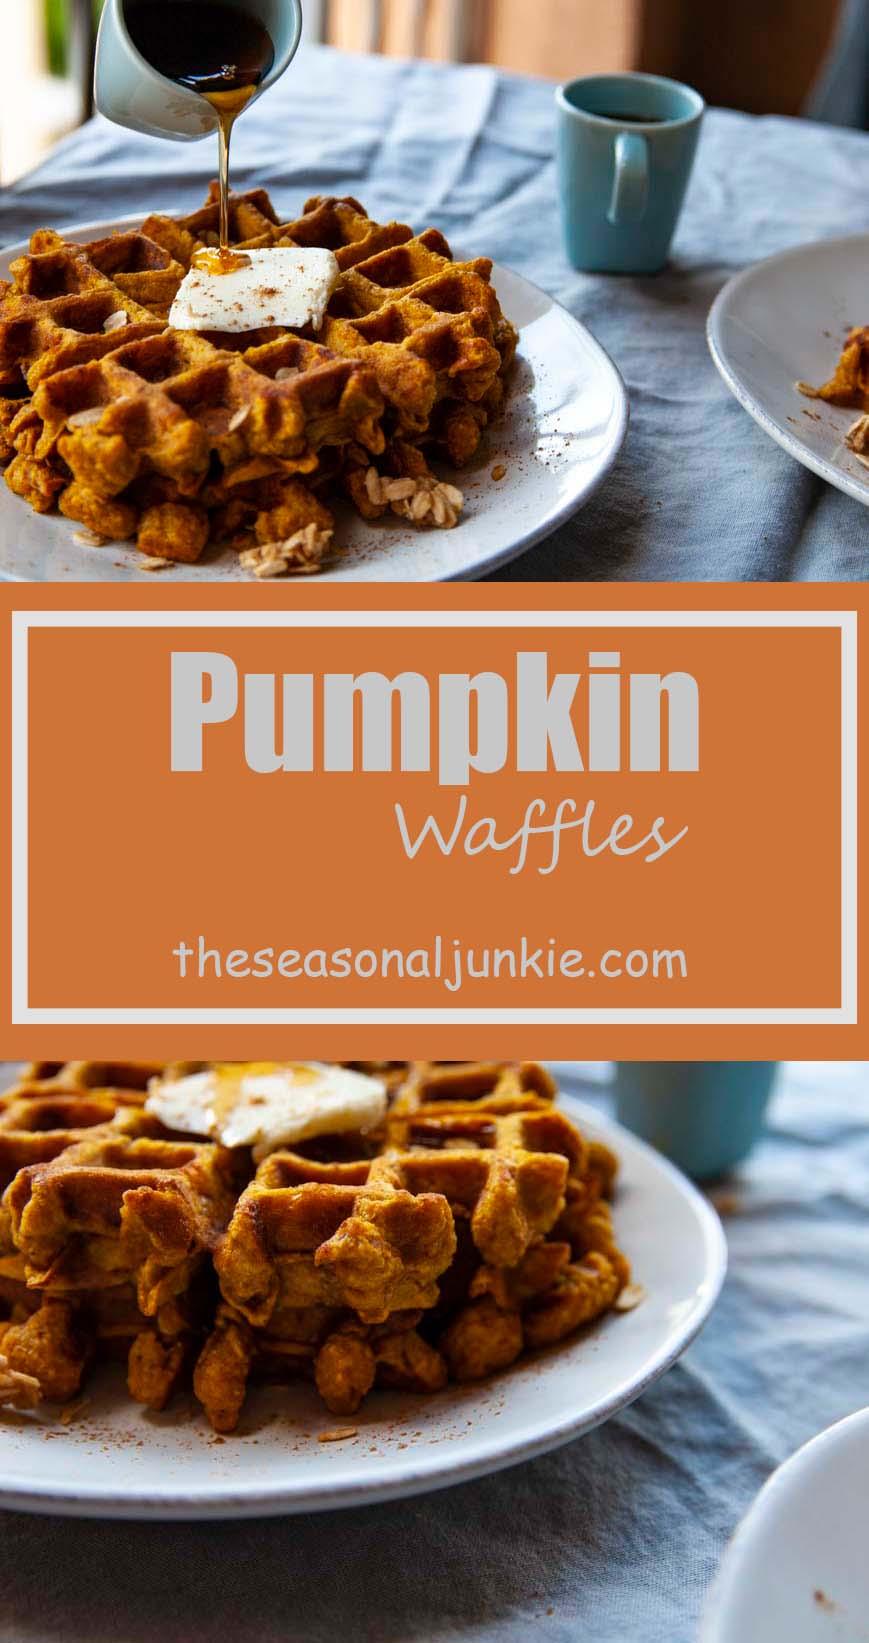 Pumpkin Waffles The Seasonal Junkie